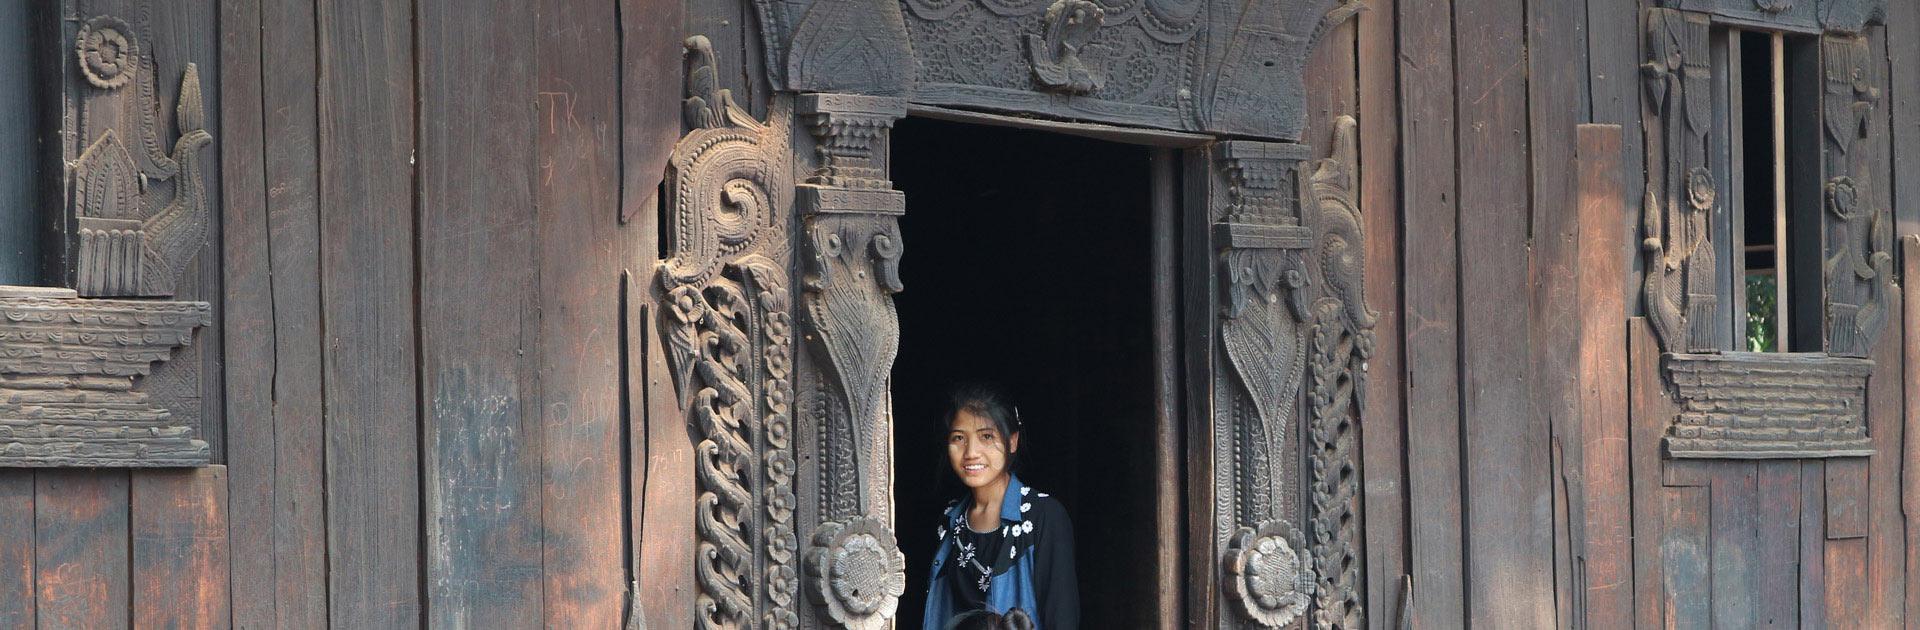 MM Tradición de Myanmar 13 días 2